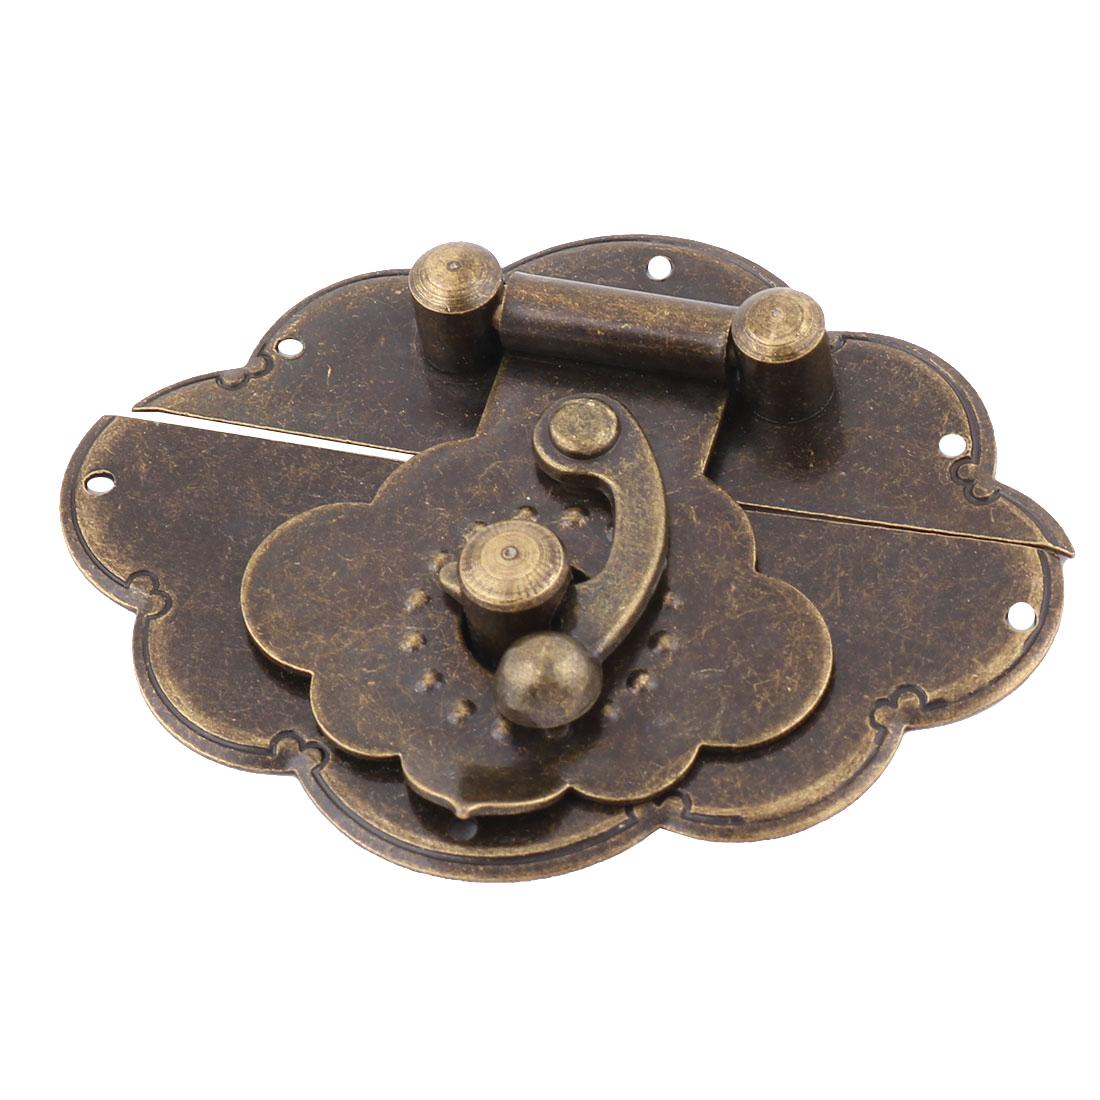 65mmx50mmx10mm Case Metal Vintage Toggle Box Latch Hasp Lock Bronze Tone